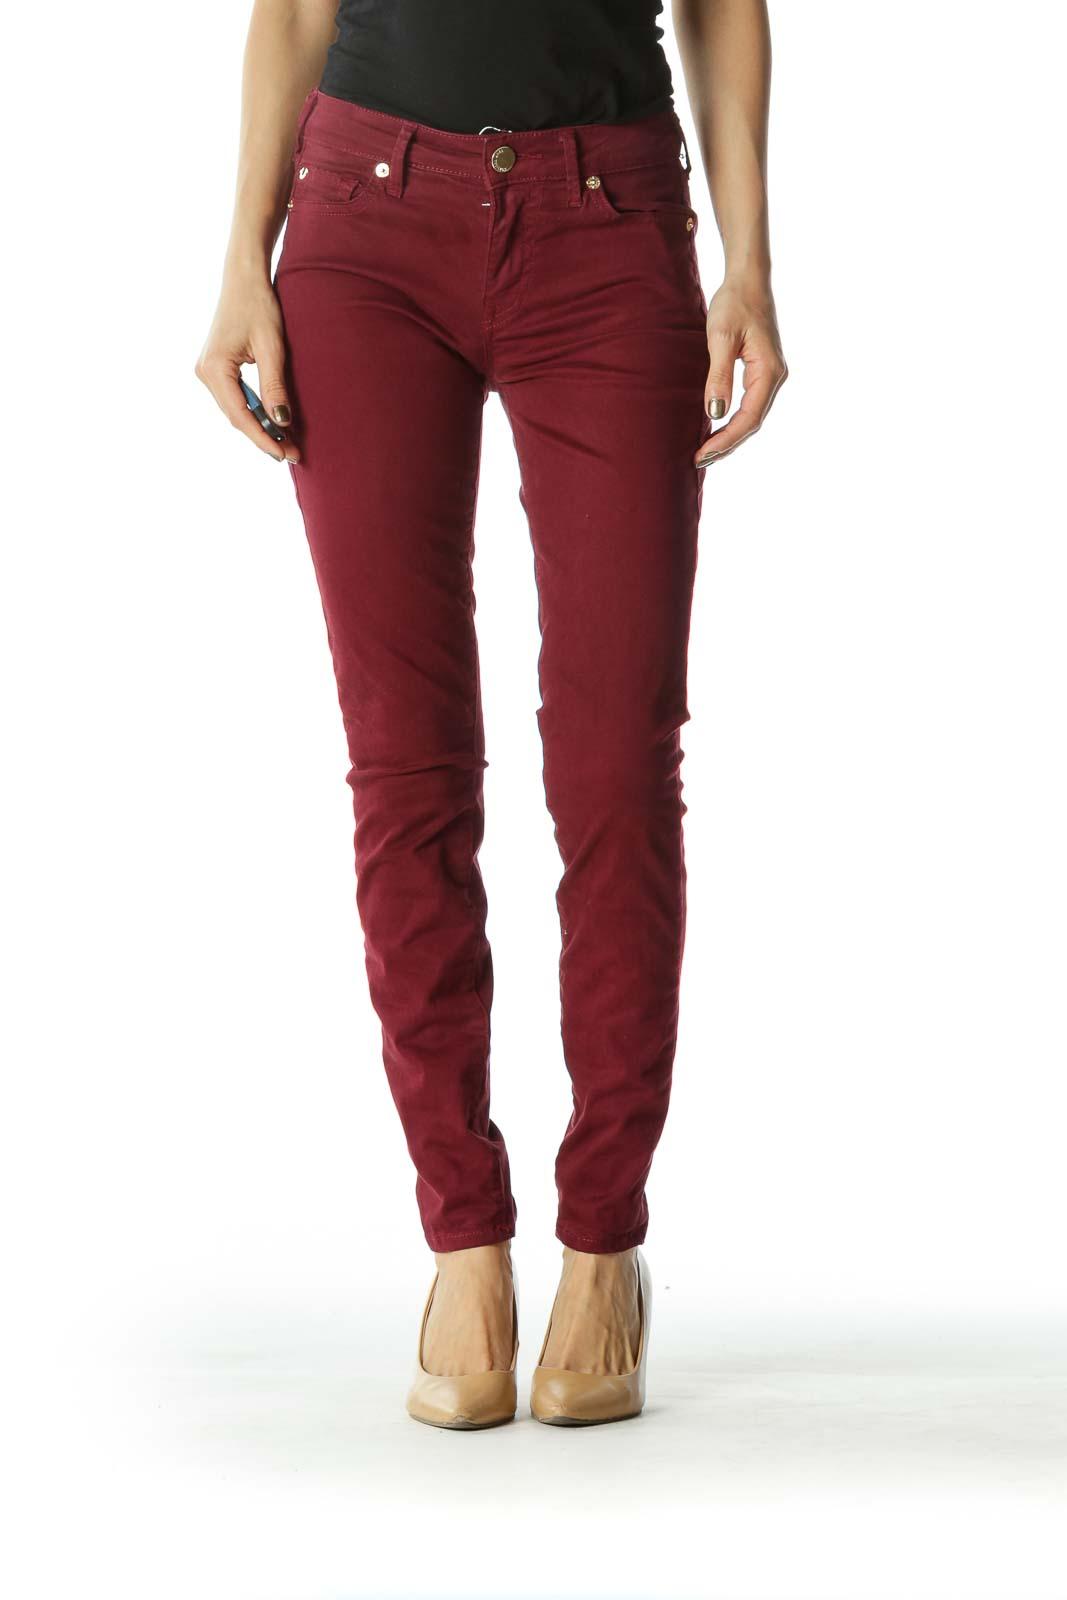 Crimson Red Skinny Pants Front